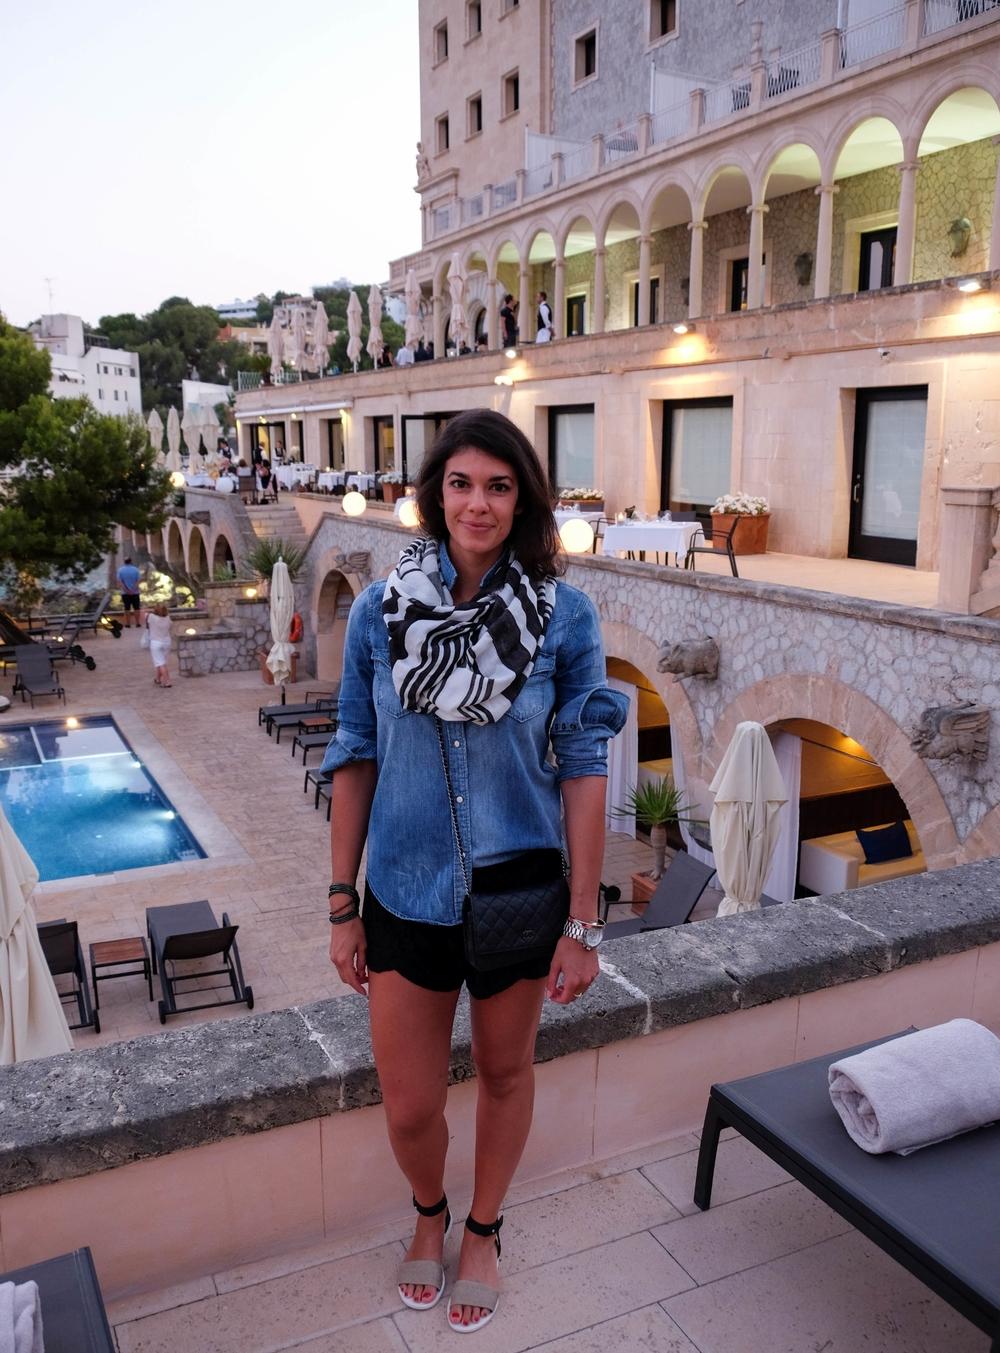 LaurenSchwaiger-Travel-Blog-Mallorca-Spain-OOTN-Hospes-Maricel-Hotel.jpg